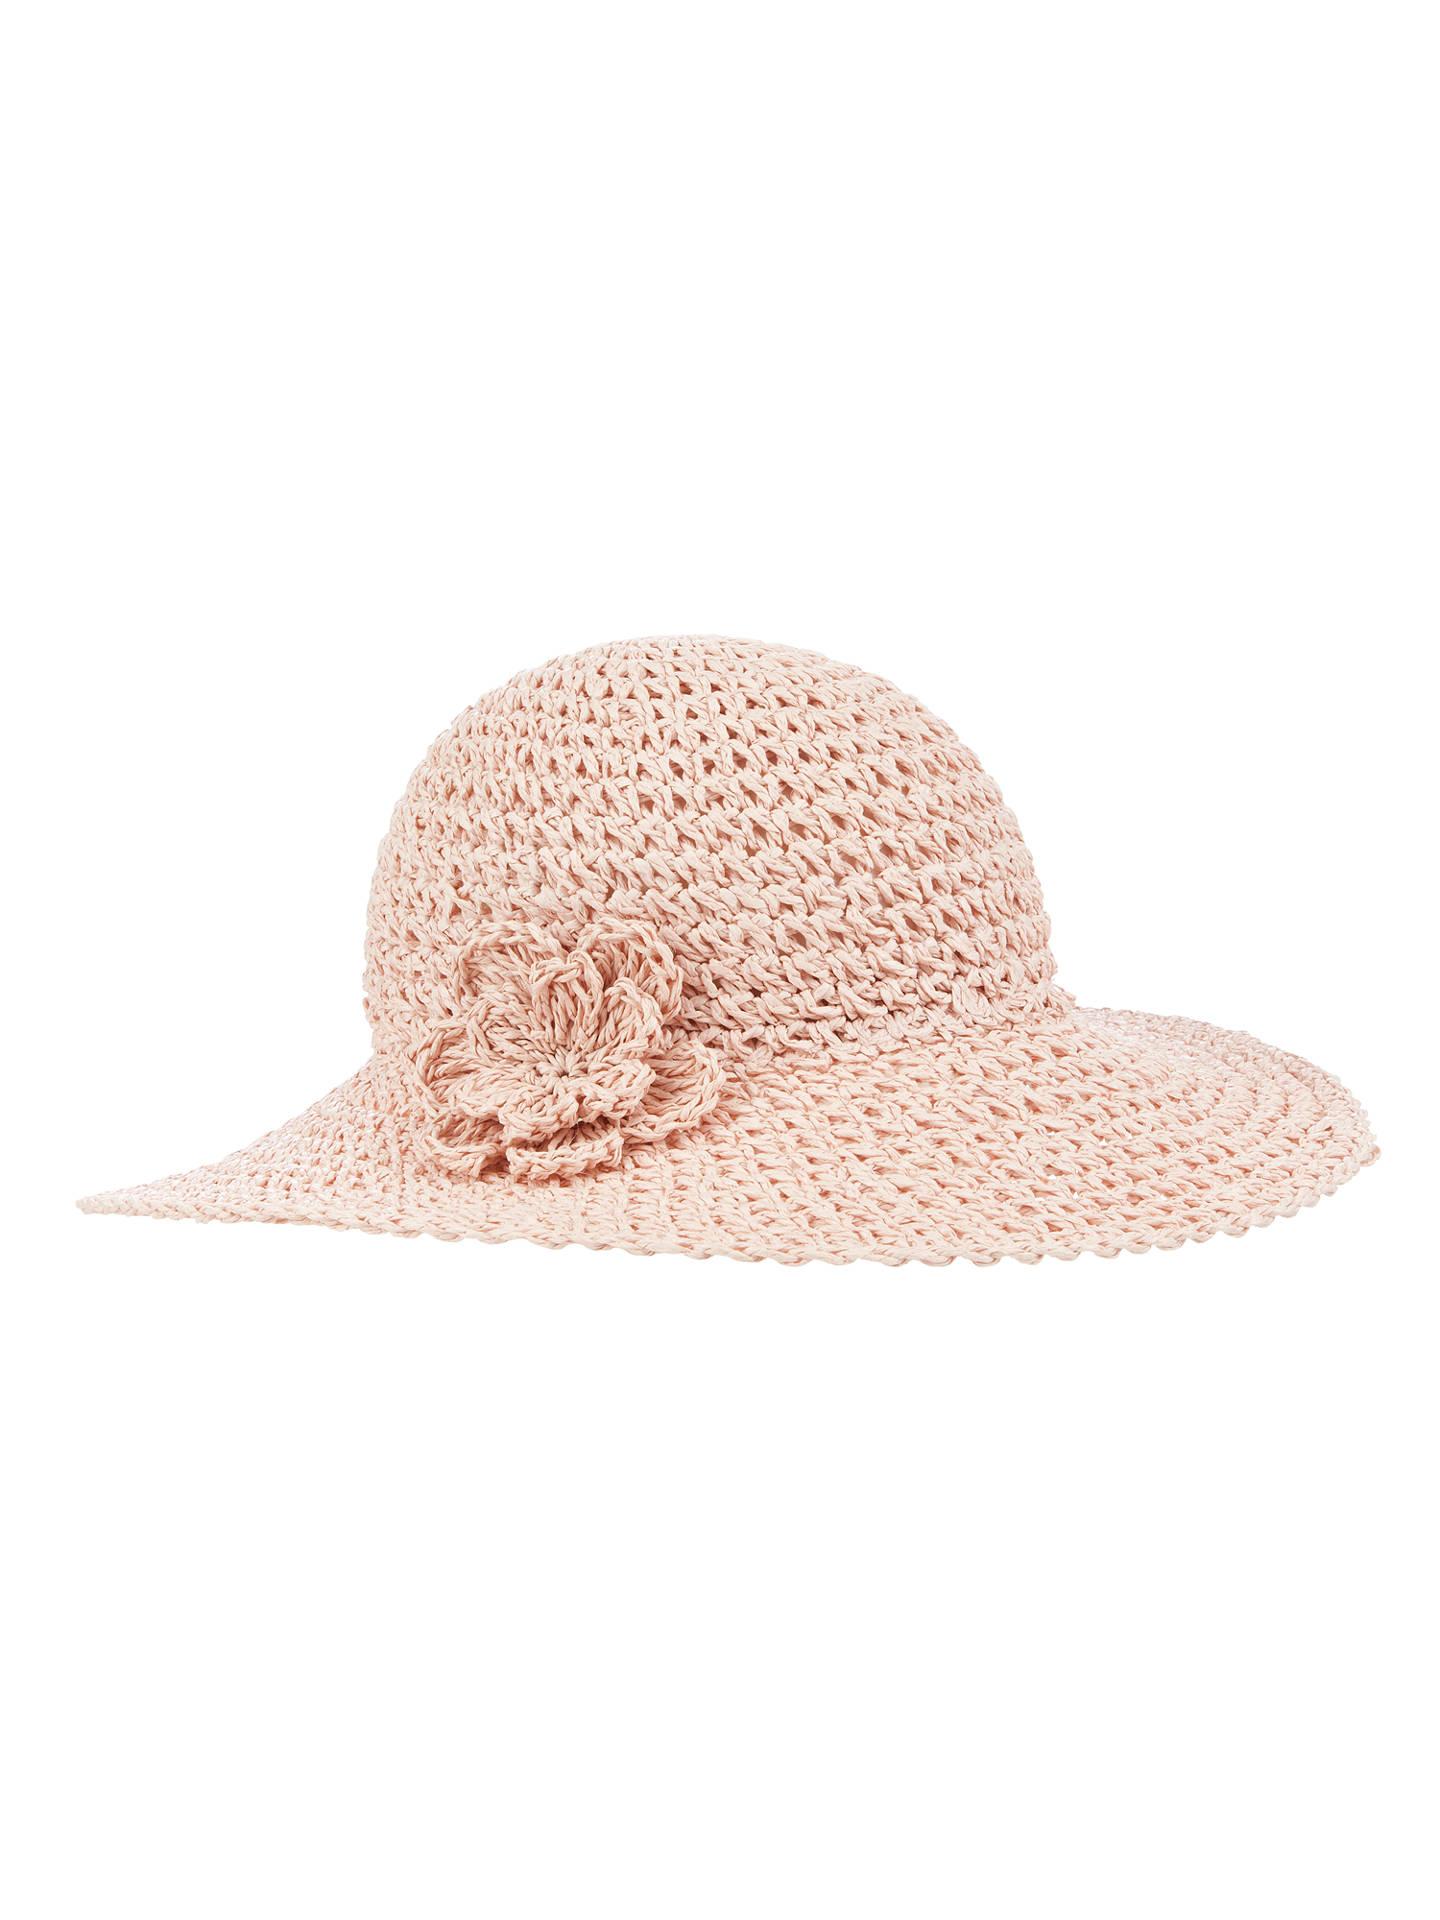 212c2b2b Buy John Lewis Girl Straw Cloche Hat, Pink, 2-4 years Online at ...